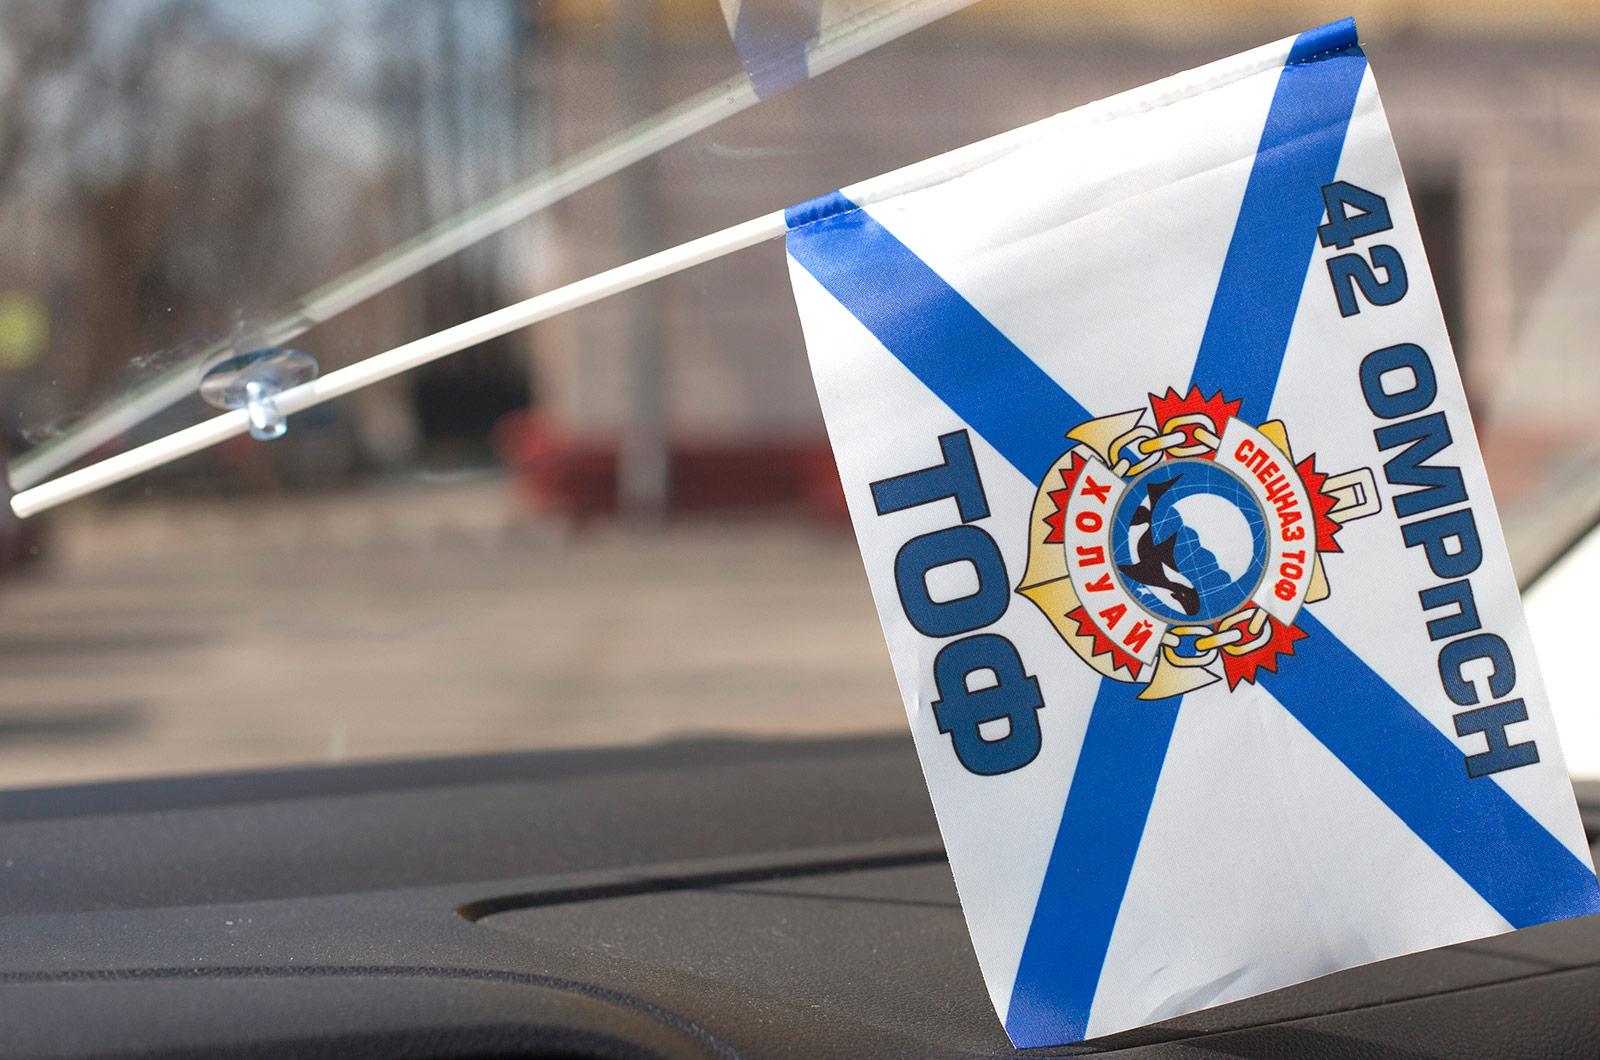 Флаг Холуай спецназ ТОФ, 42 ОМРПСпН